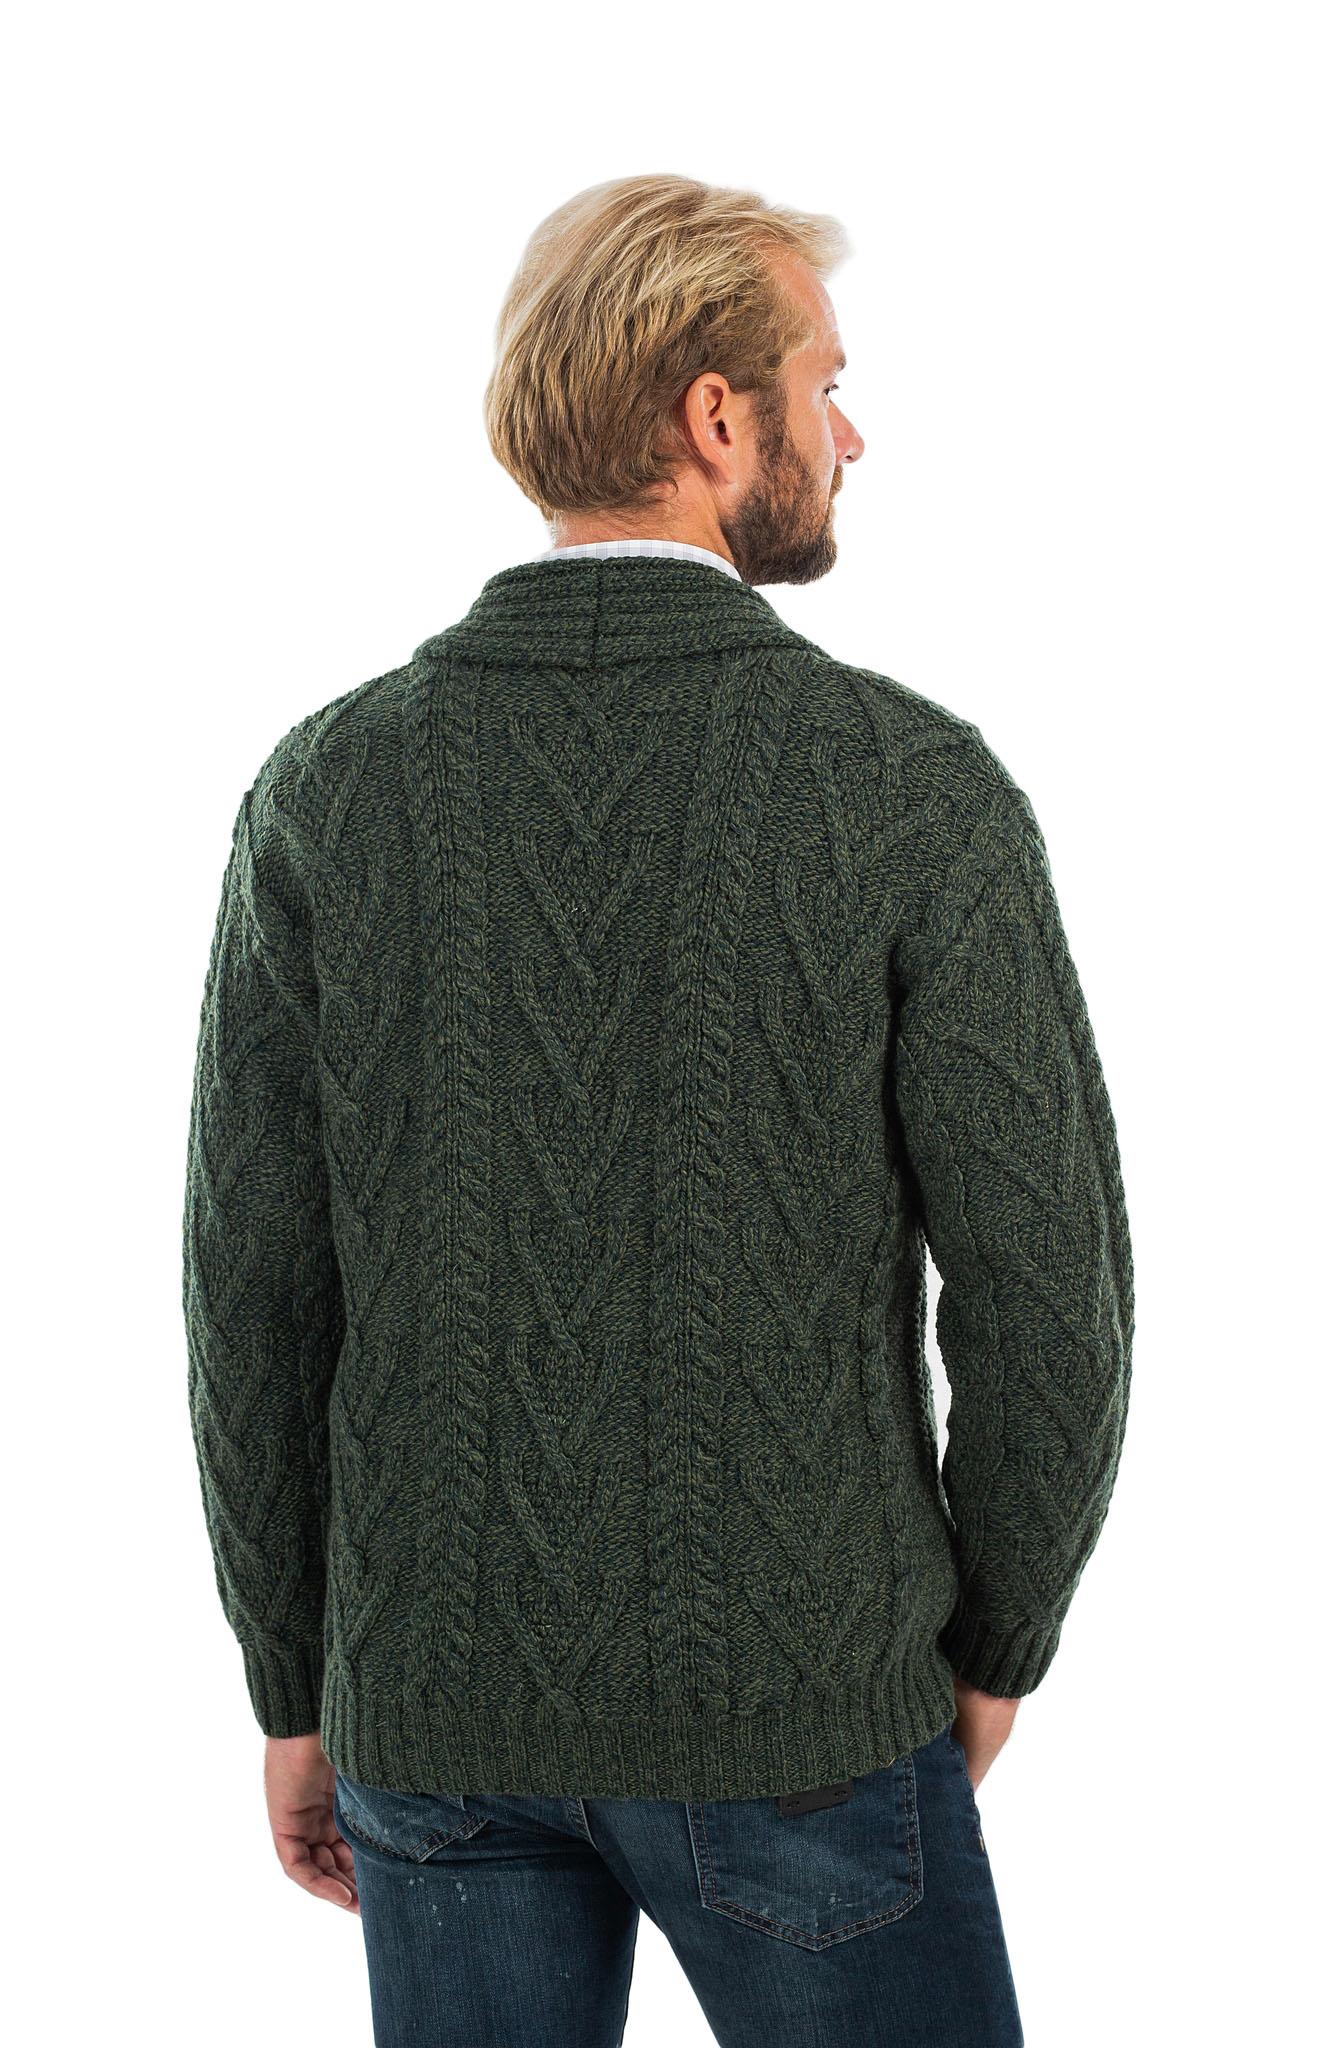 SAOL-Mens-Irish-Merino-Wool-Cardigan-Shawl-Collar-Front-Pockets-Aran-Cable-Knit thumbnail 7